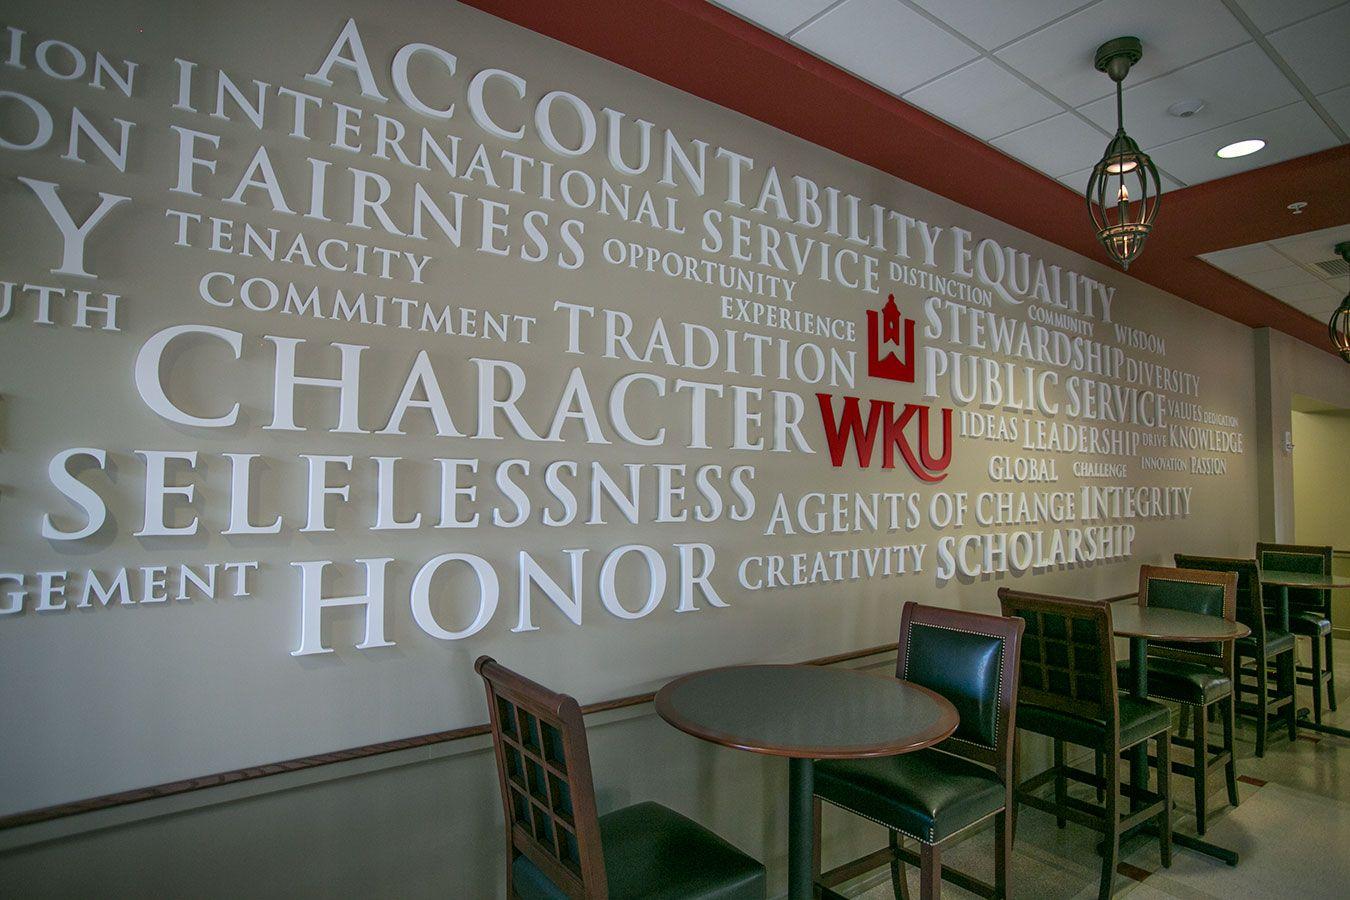 Wku Honors College And International Center Office Design Western Kentucky University Design